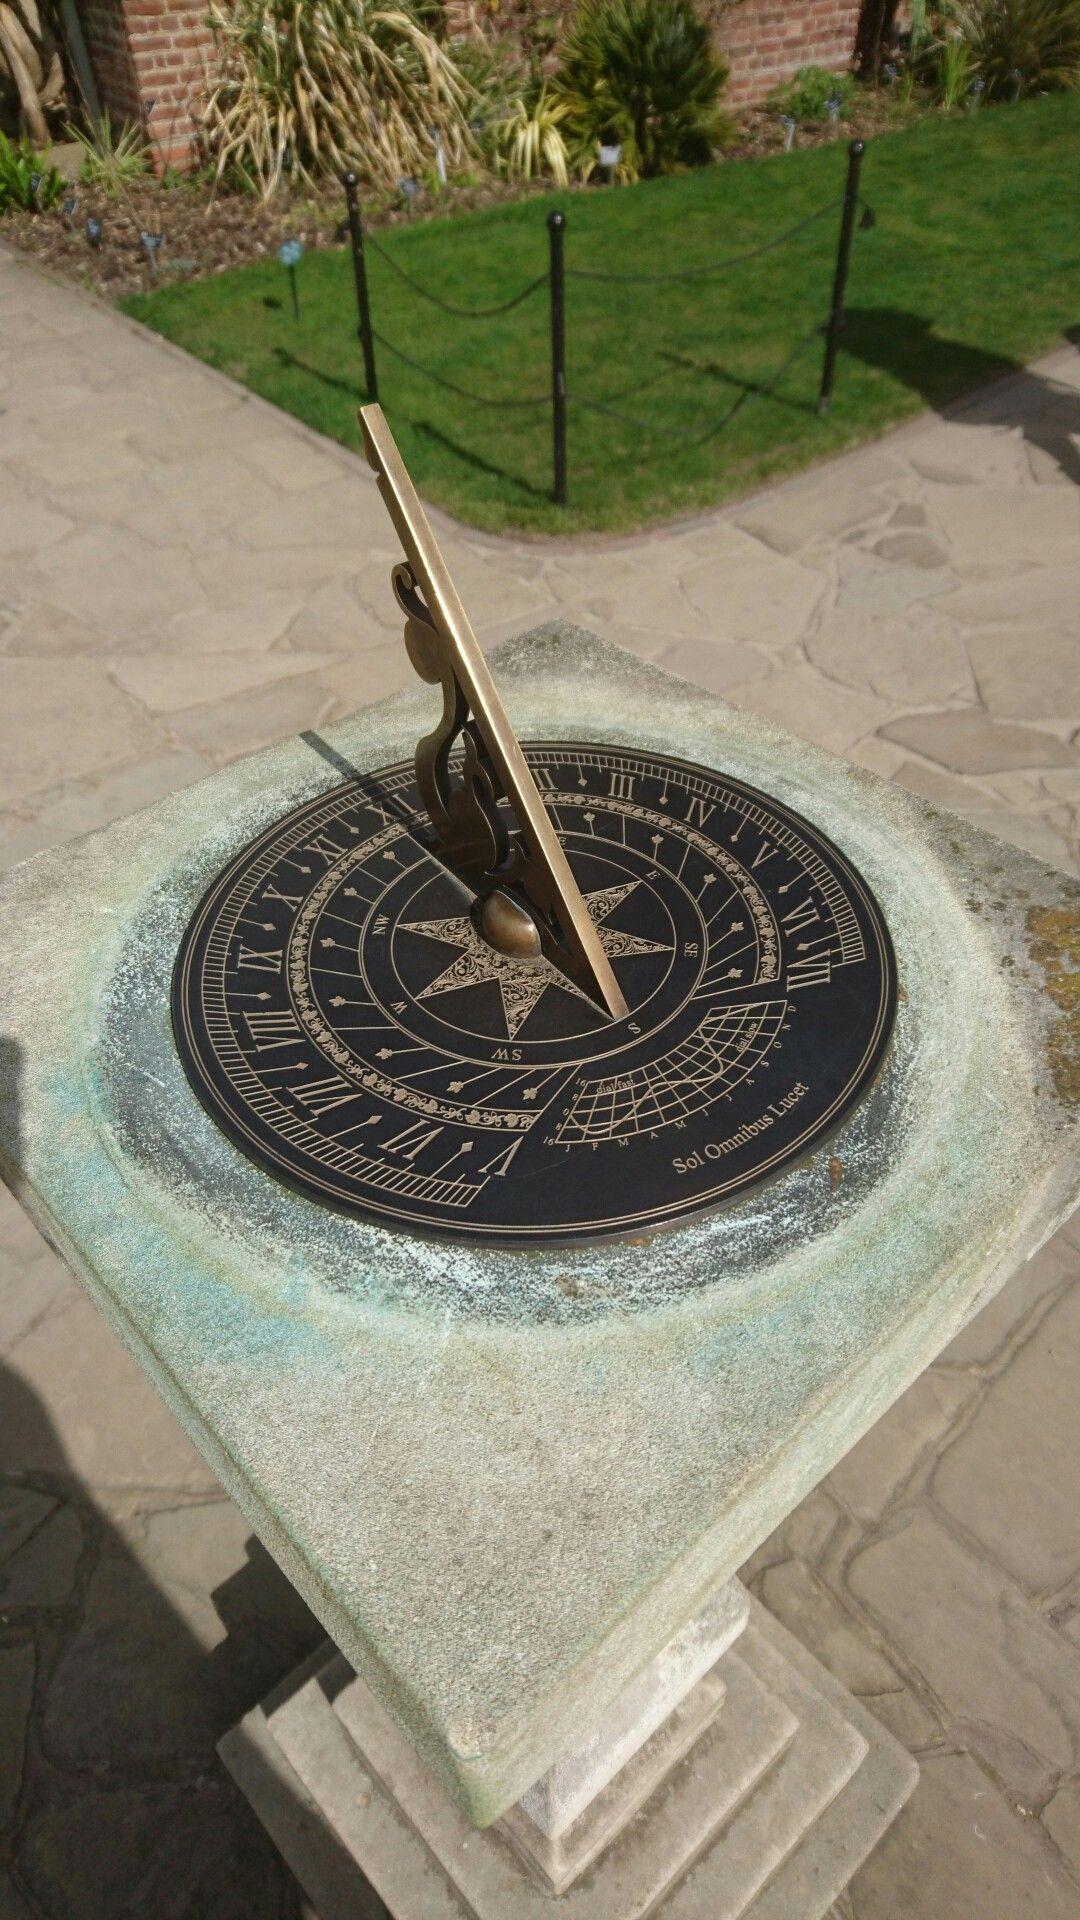 Wisley gardens, sundial | Sundial | Pinterest | Gardens, Clocks and